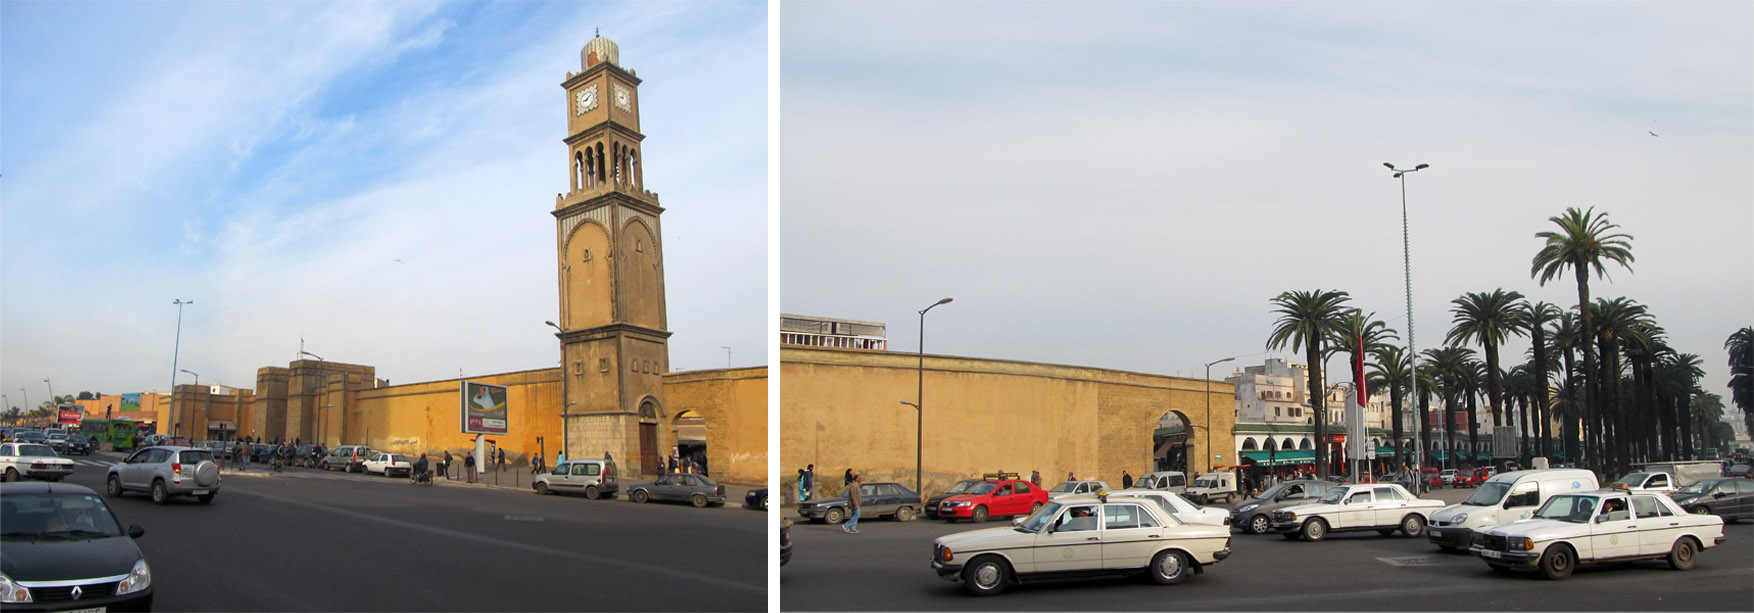 31 maroko kazablanka medina